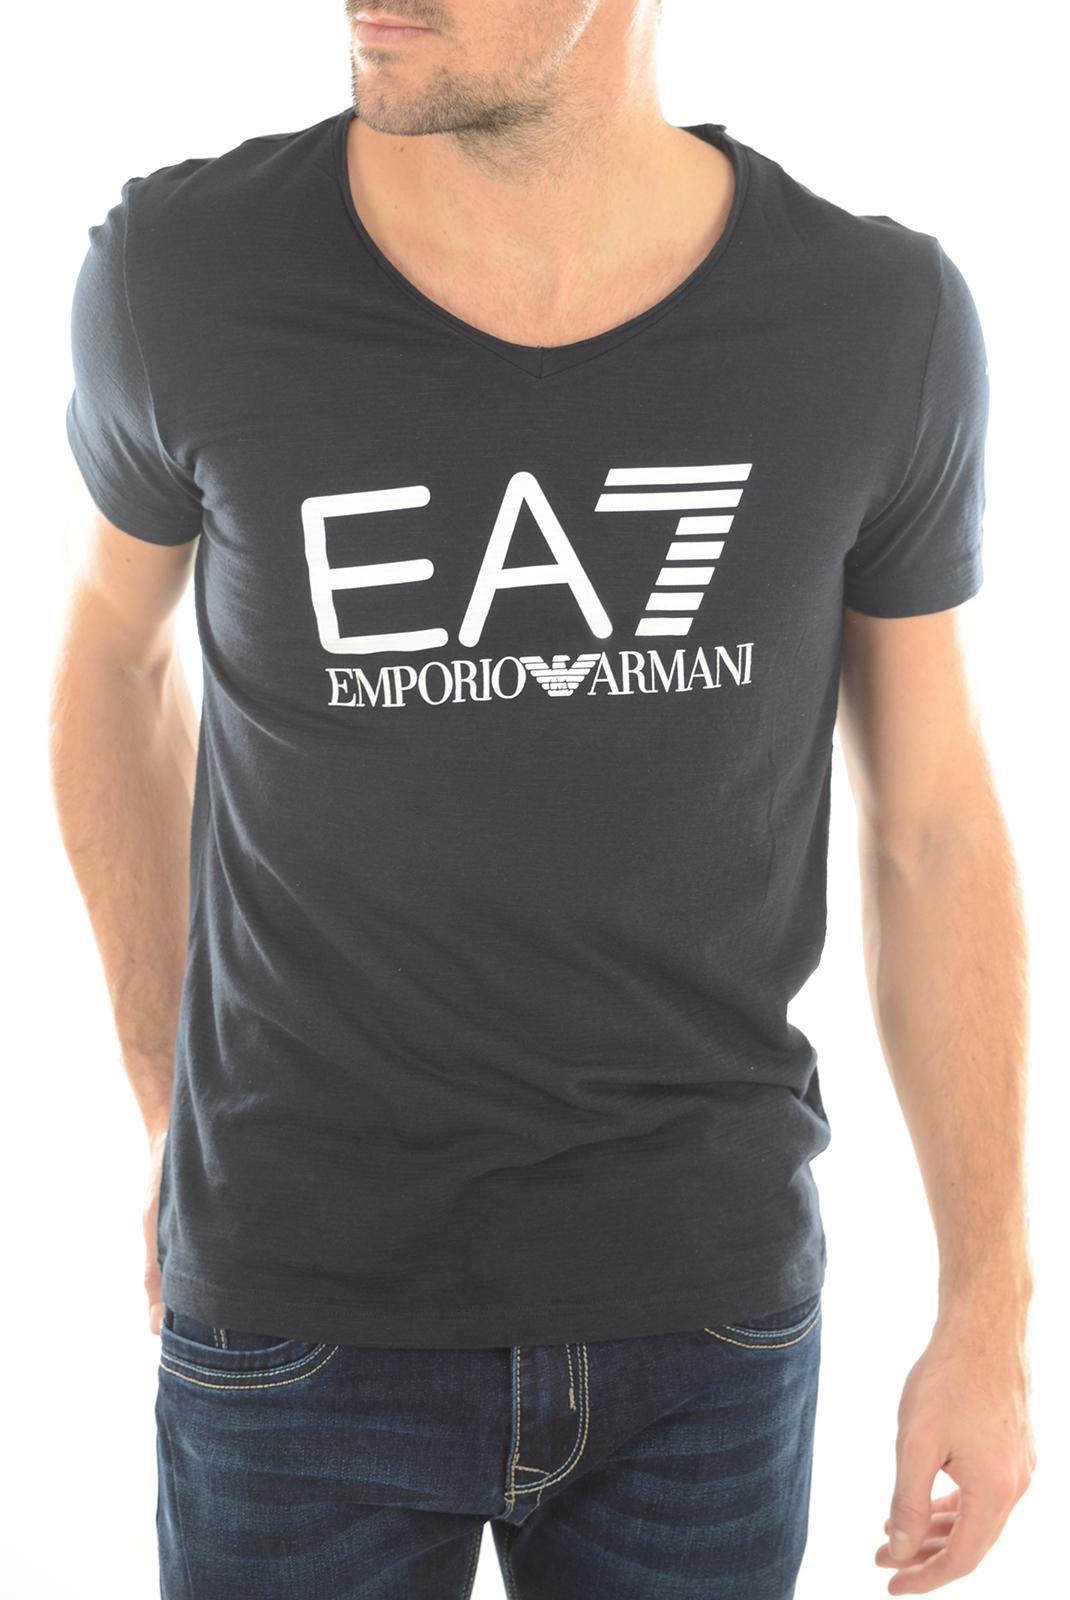 Tee-shirts manches courtes  Emporio armani 903018 6P625 NAVY 02836